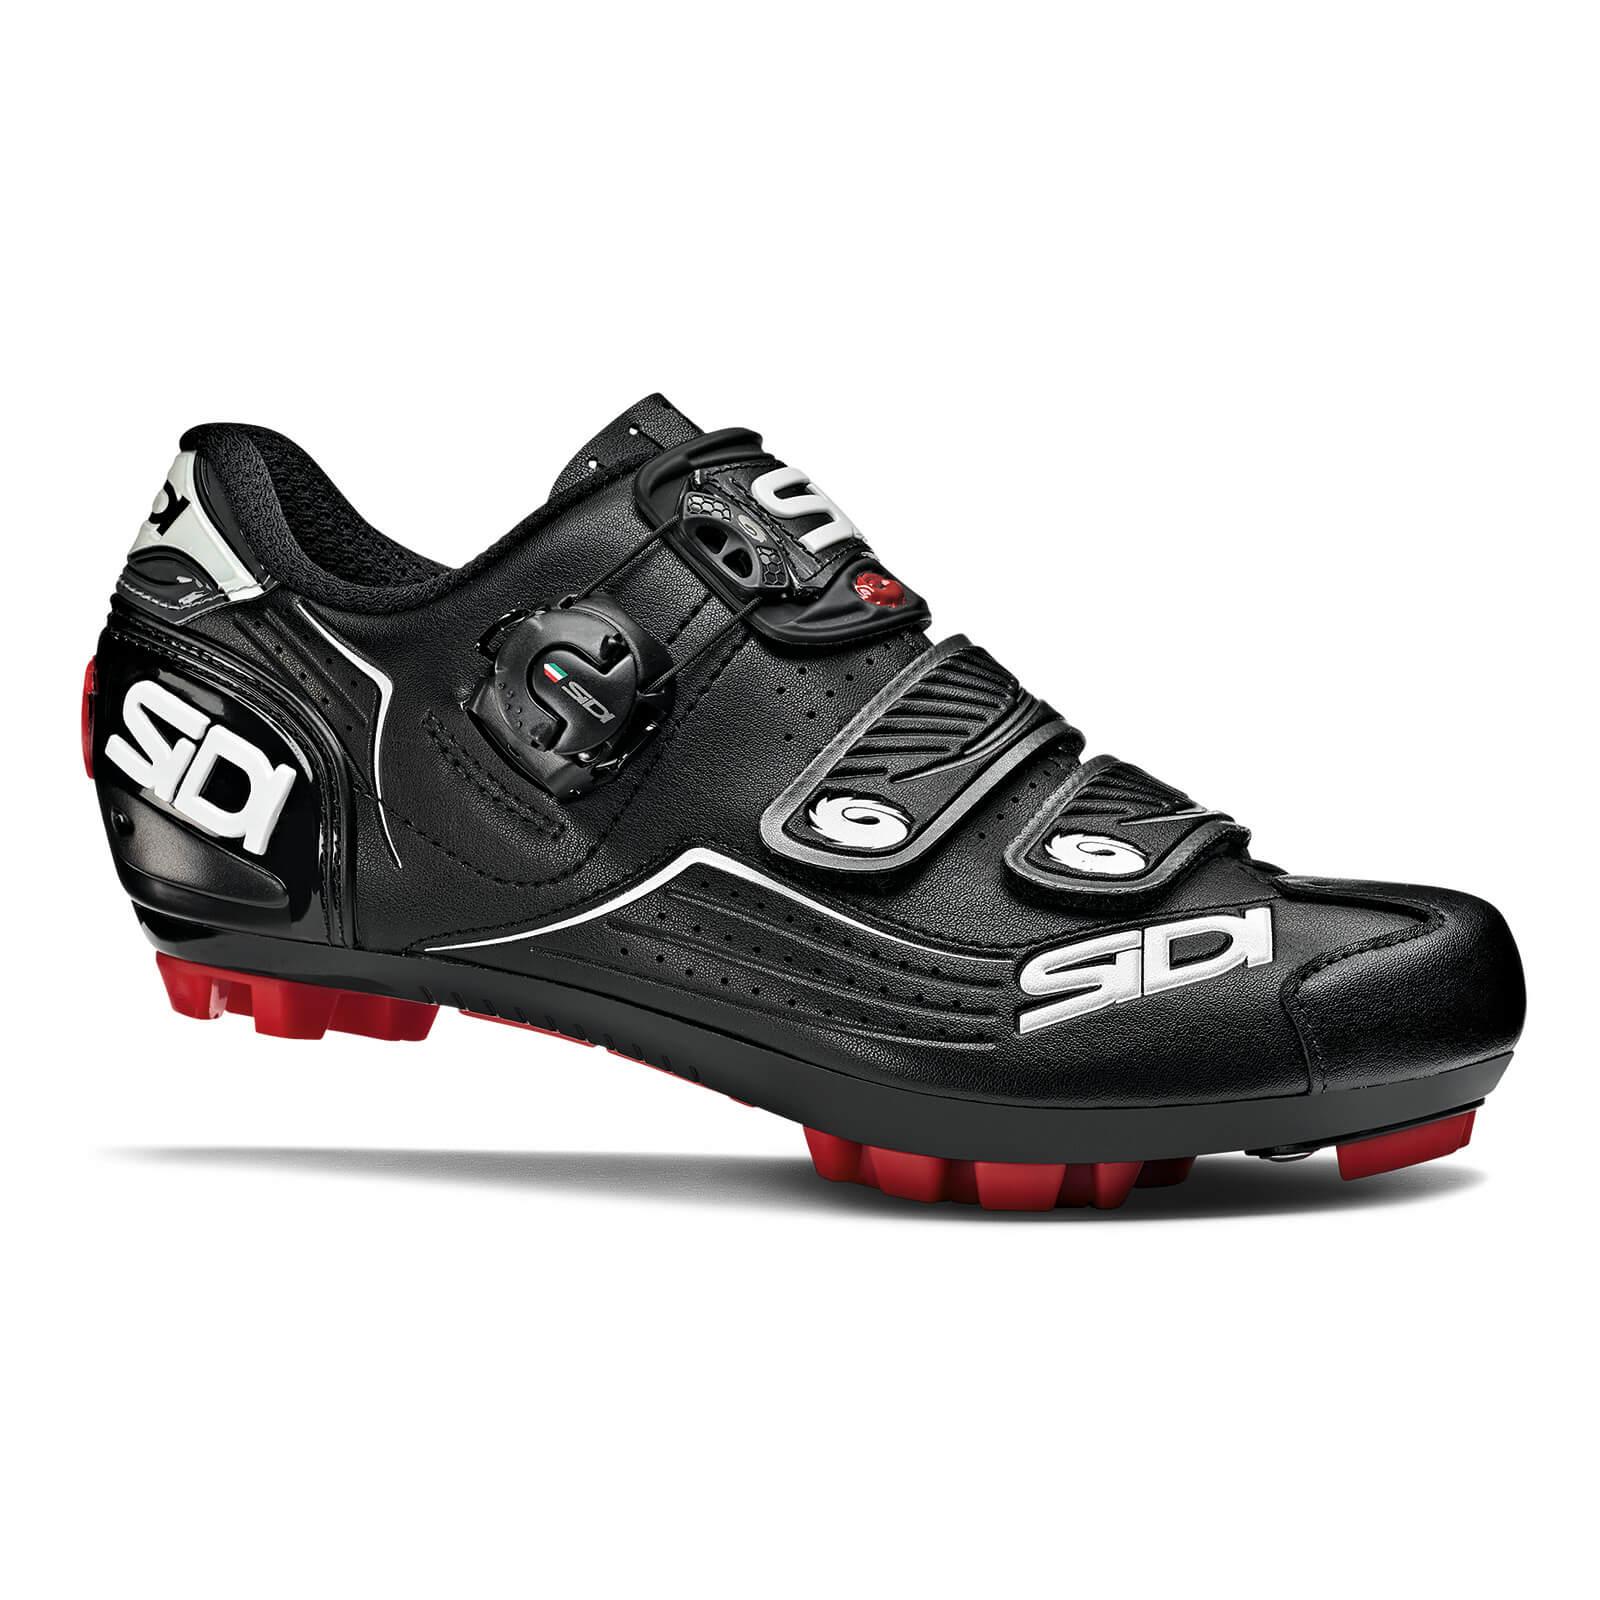 Sidi Women's Trace MTB Shoes - EU 43